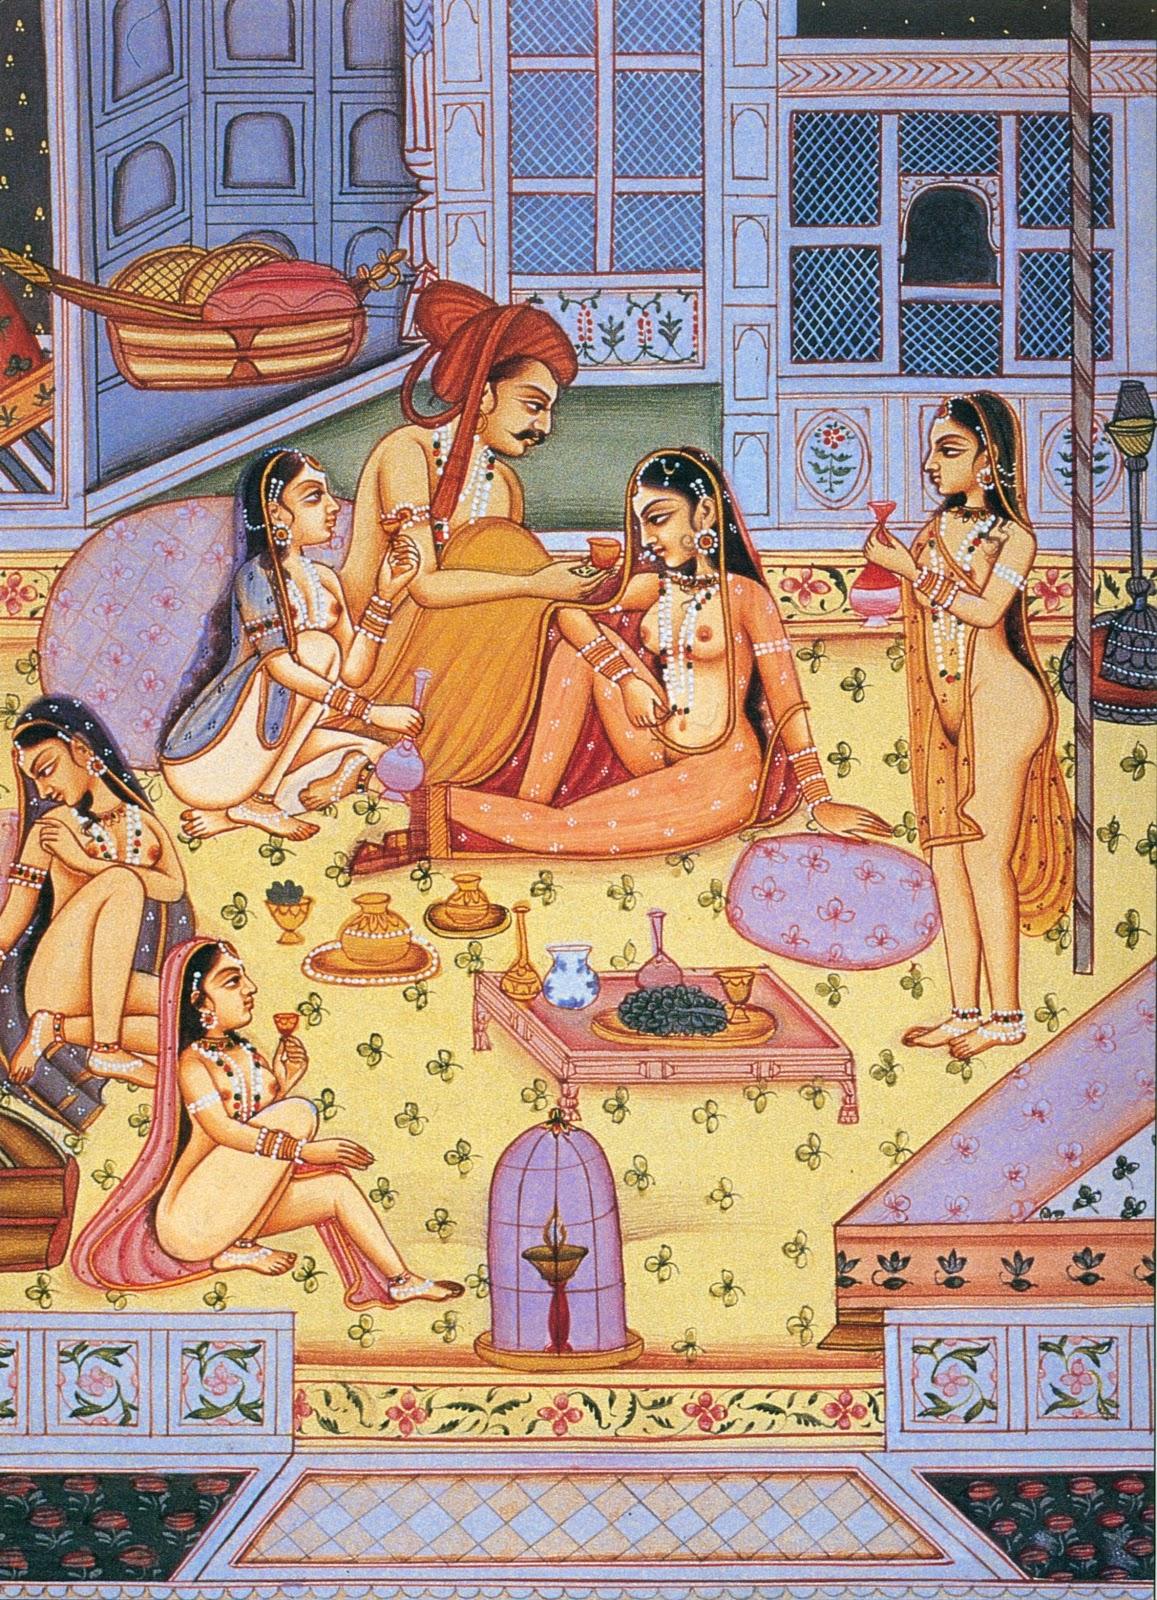 камасутра индийские картинки ласкают телочек